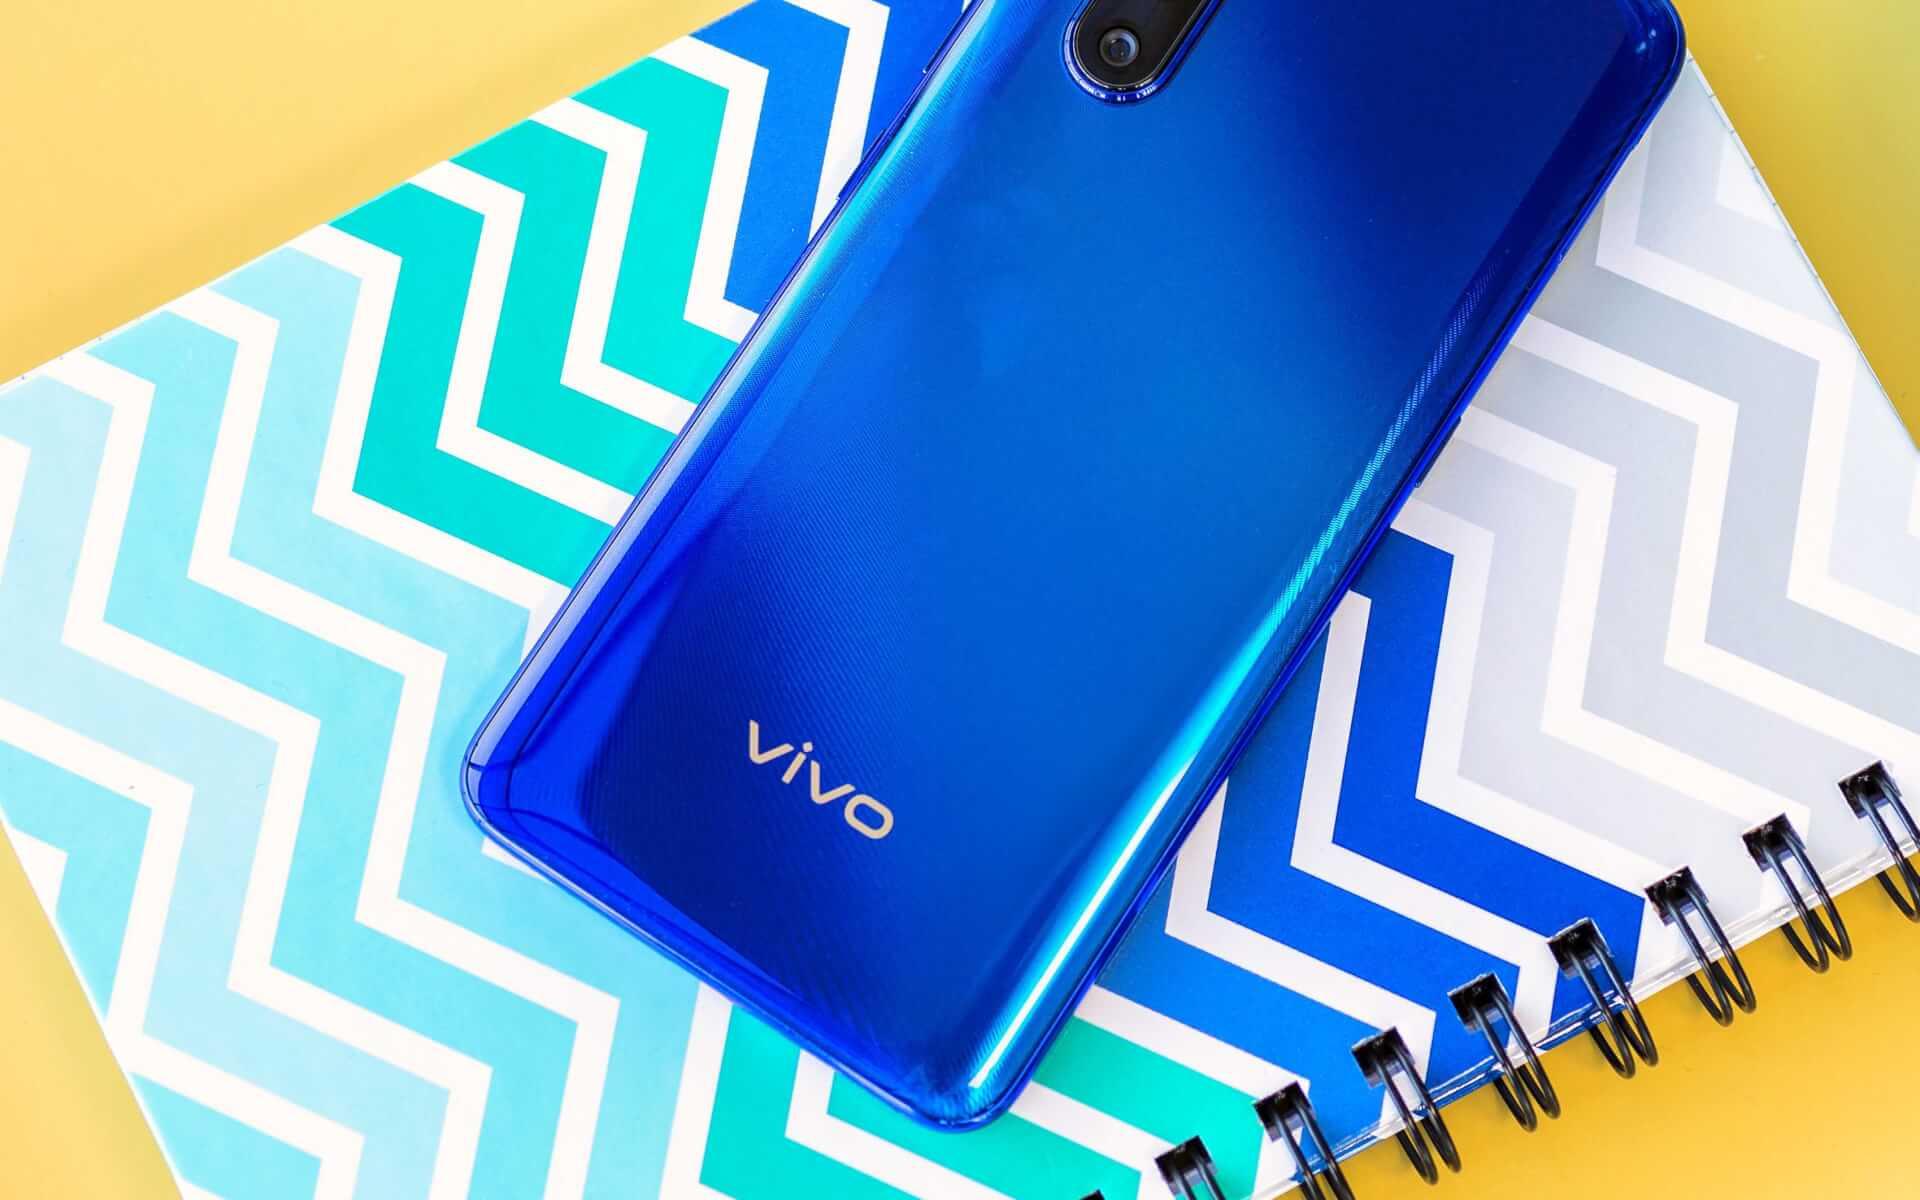 vivo-x27-will-launch-march-19